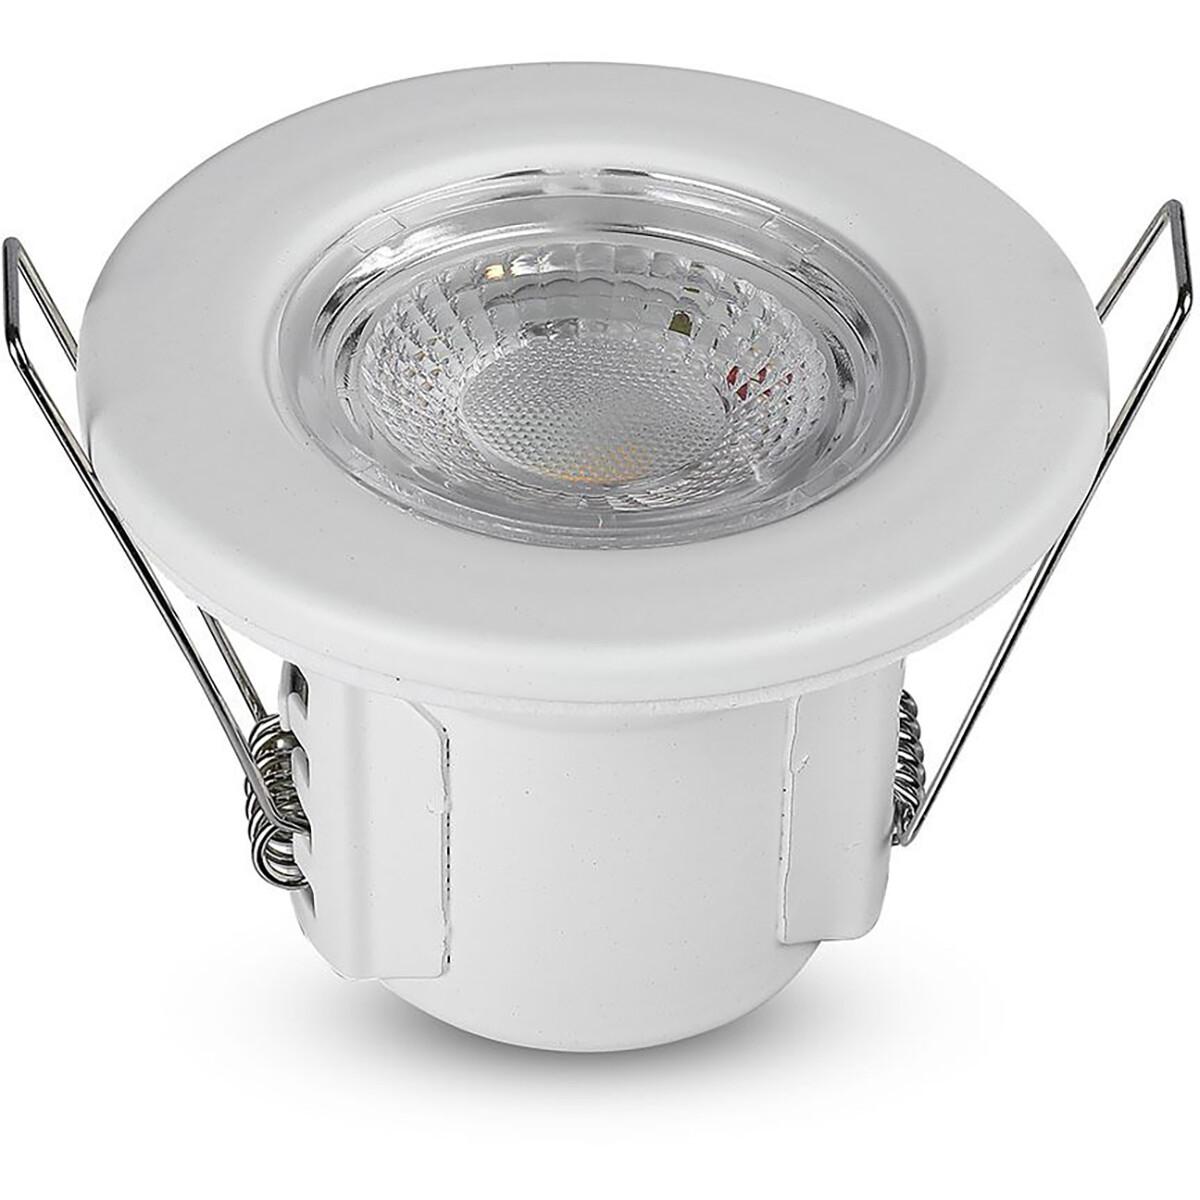 SAMSUNG - LED Spot - Inbouwspot - Viron Cunvi - 5W - Waterdicht IP65 - Dimbaar - Helder/Koud Wit 640